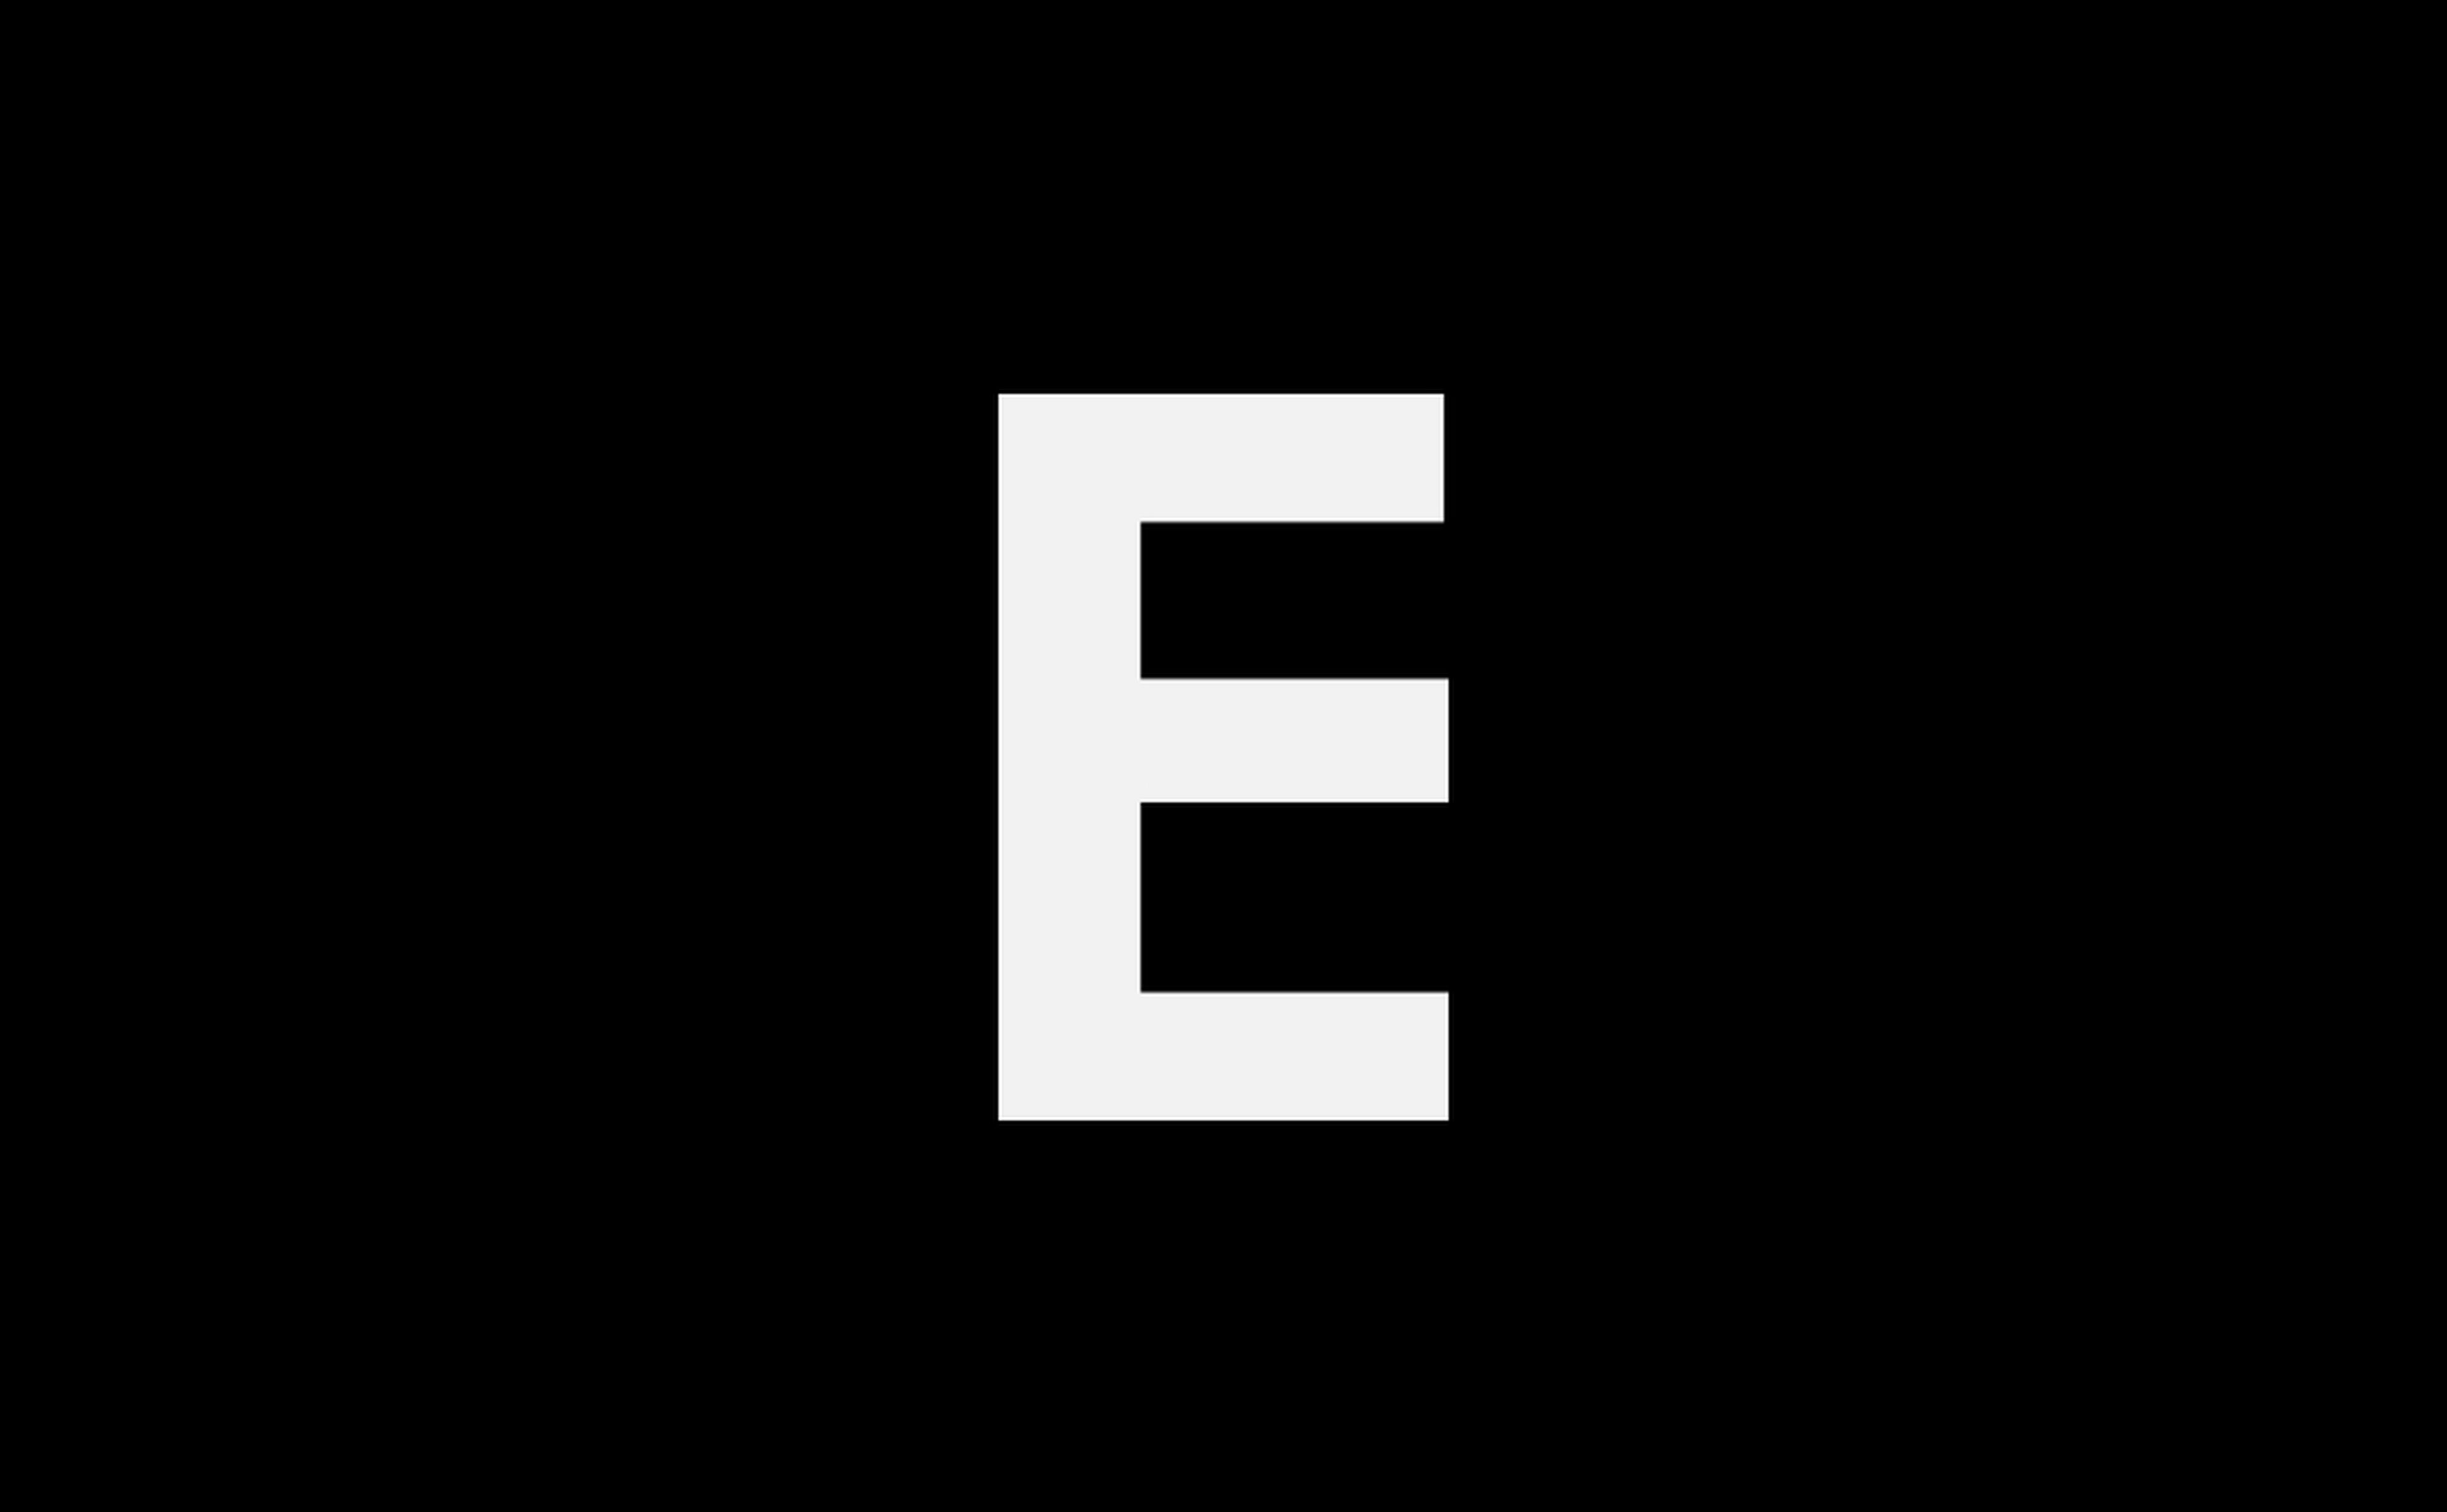 Nenggak dulu sblm memuncak Samsung_id Samsulgraphy Bromountain Tehgopek